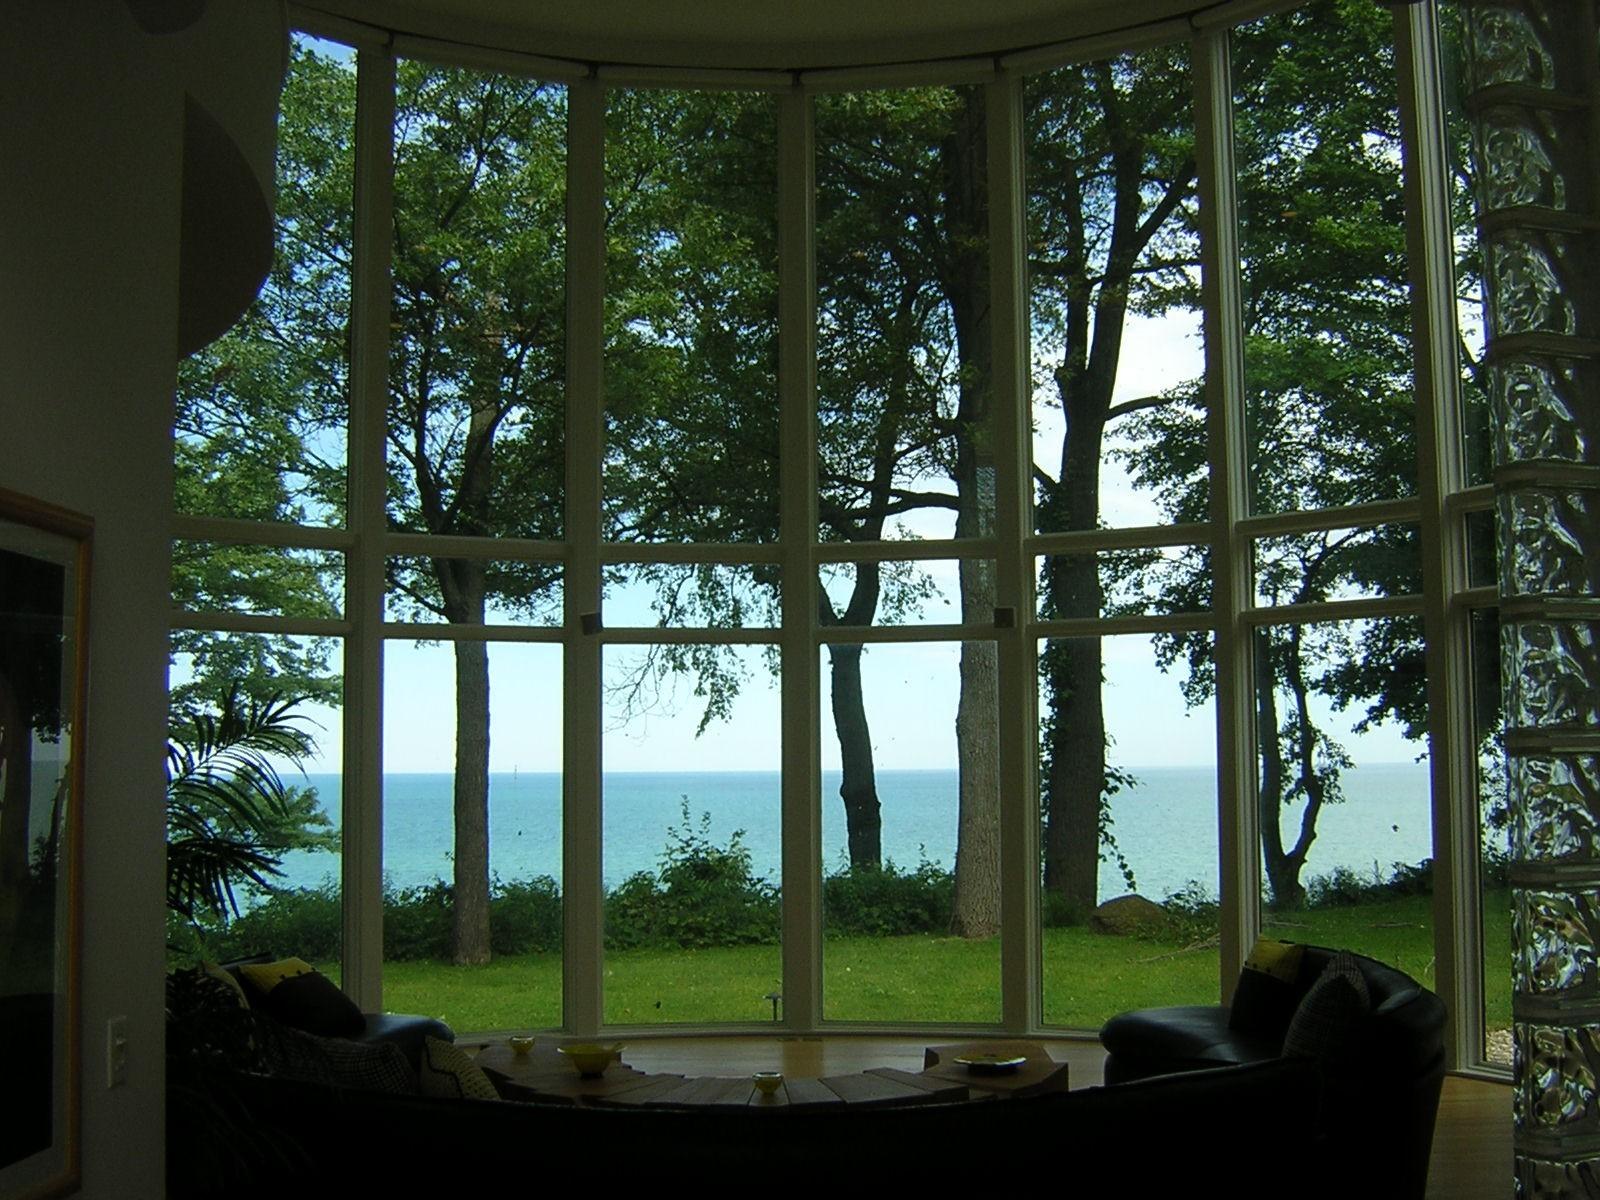 Real Estate Photography - 15930 Lake Ave, Union Pier, MI, 49129 - Location 5